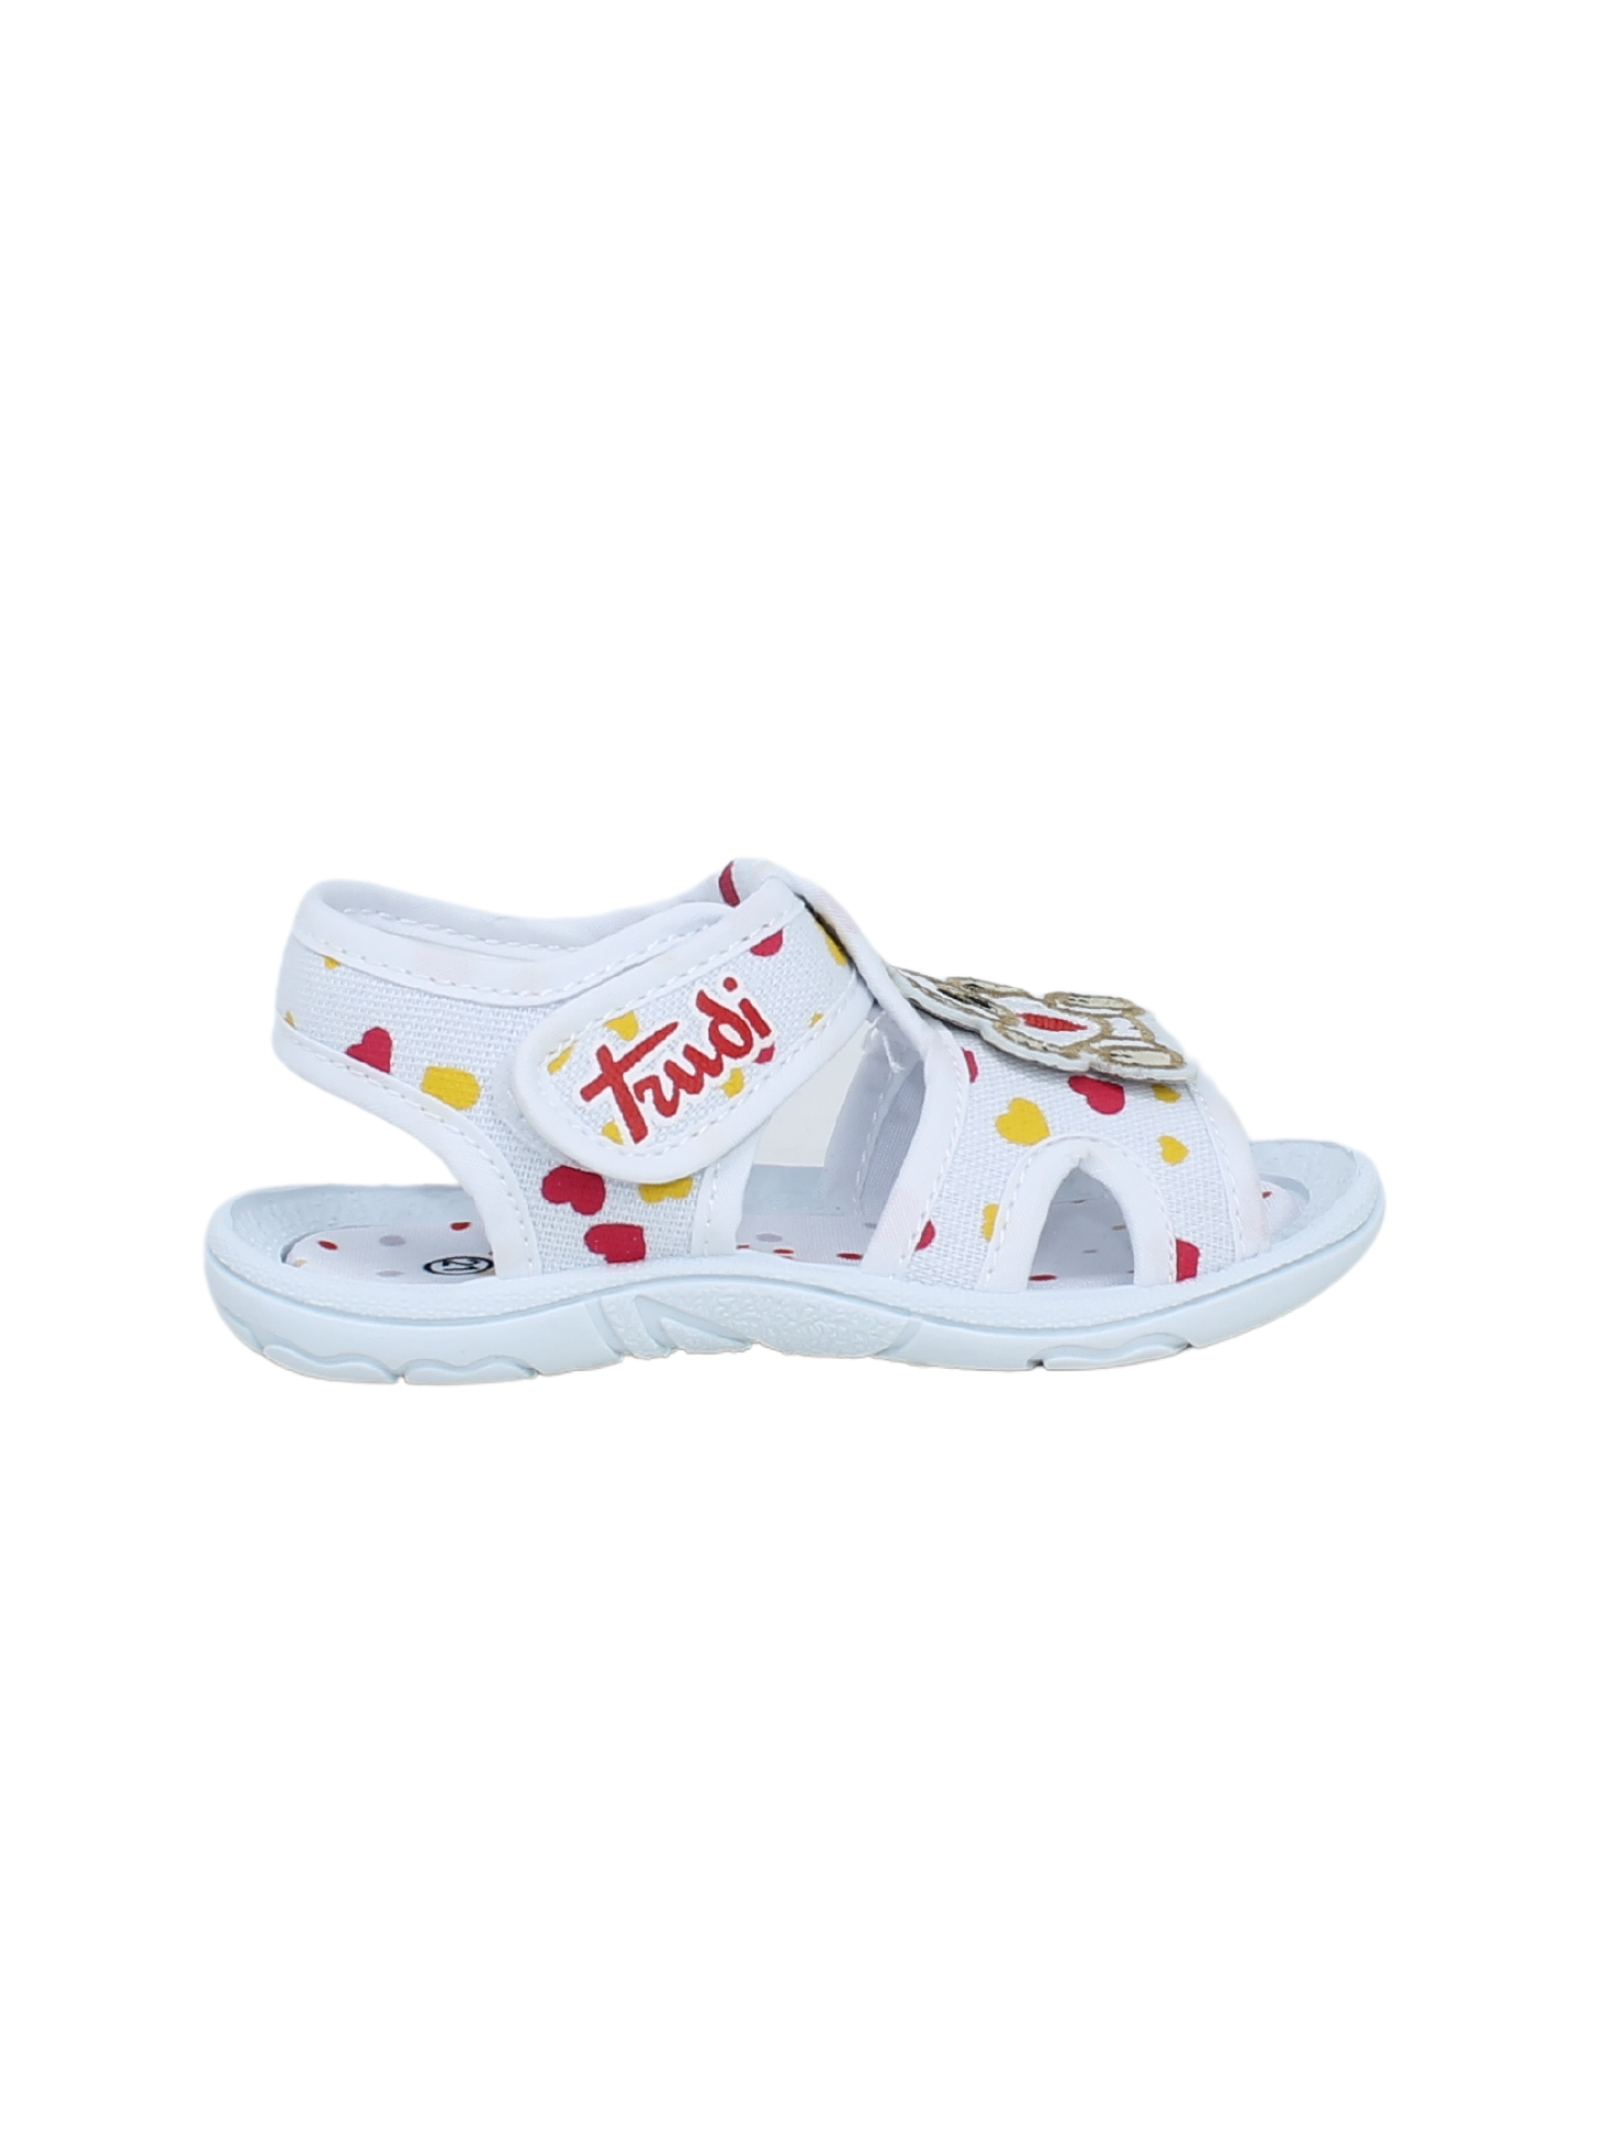 Sandalo Bambina Trudi EASY SHOES | Sandali | TRU4370BIANCO